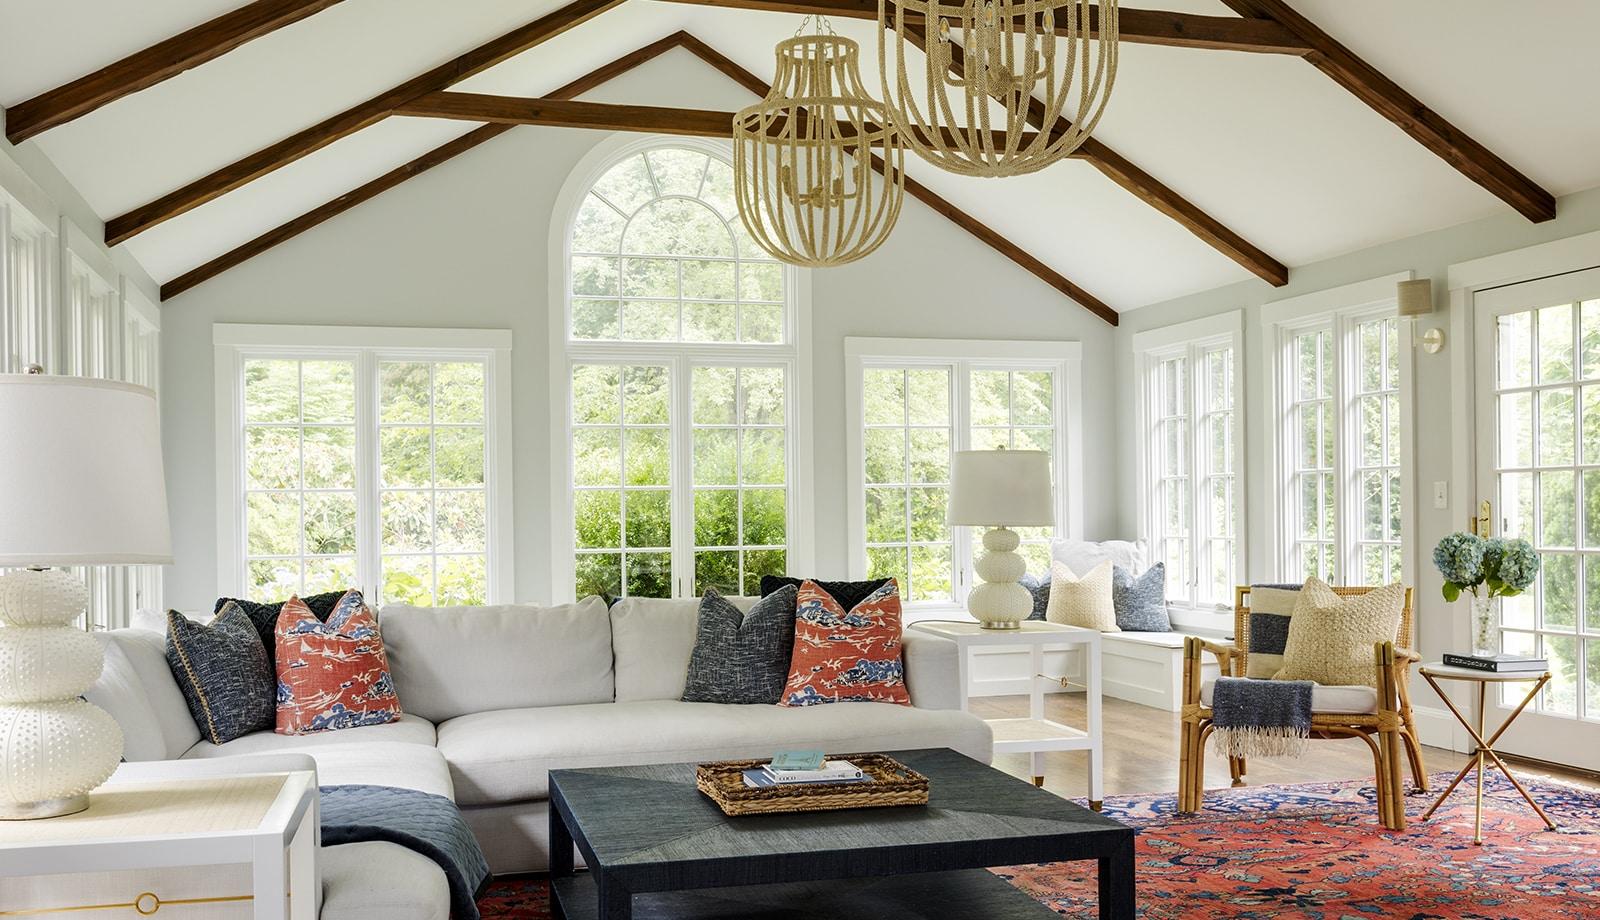 Asian Garden Colonial Hamilton MA Living Room featured